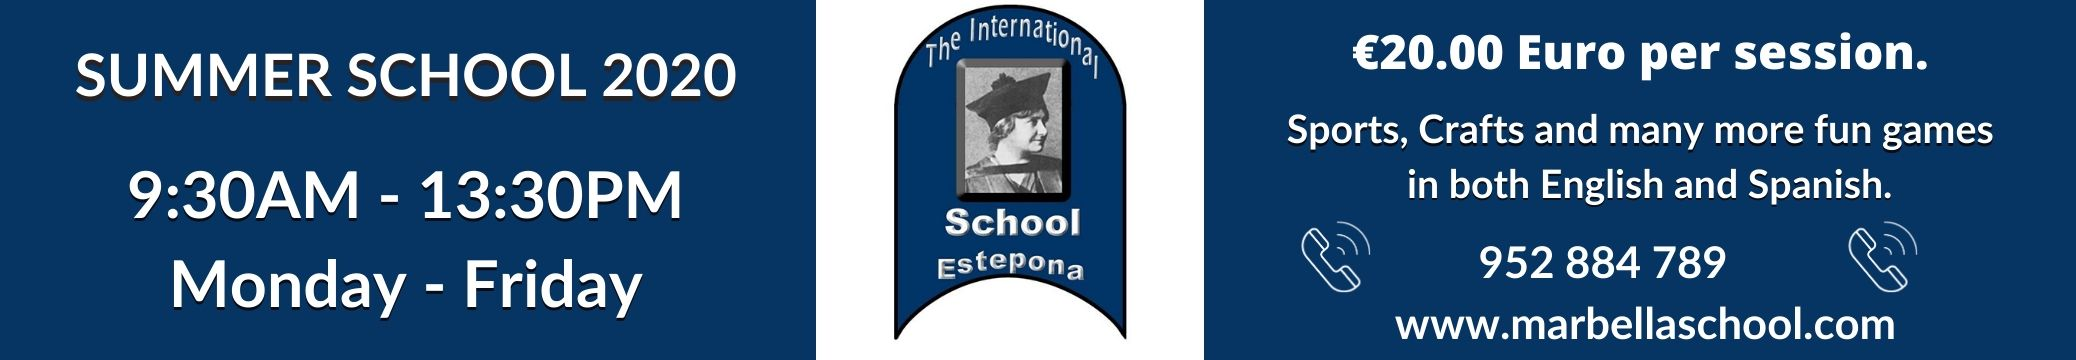 summer school estepona